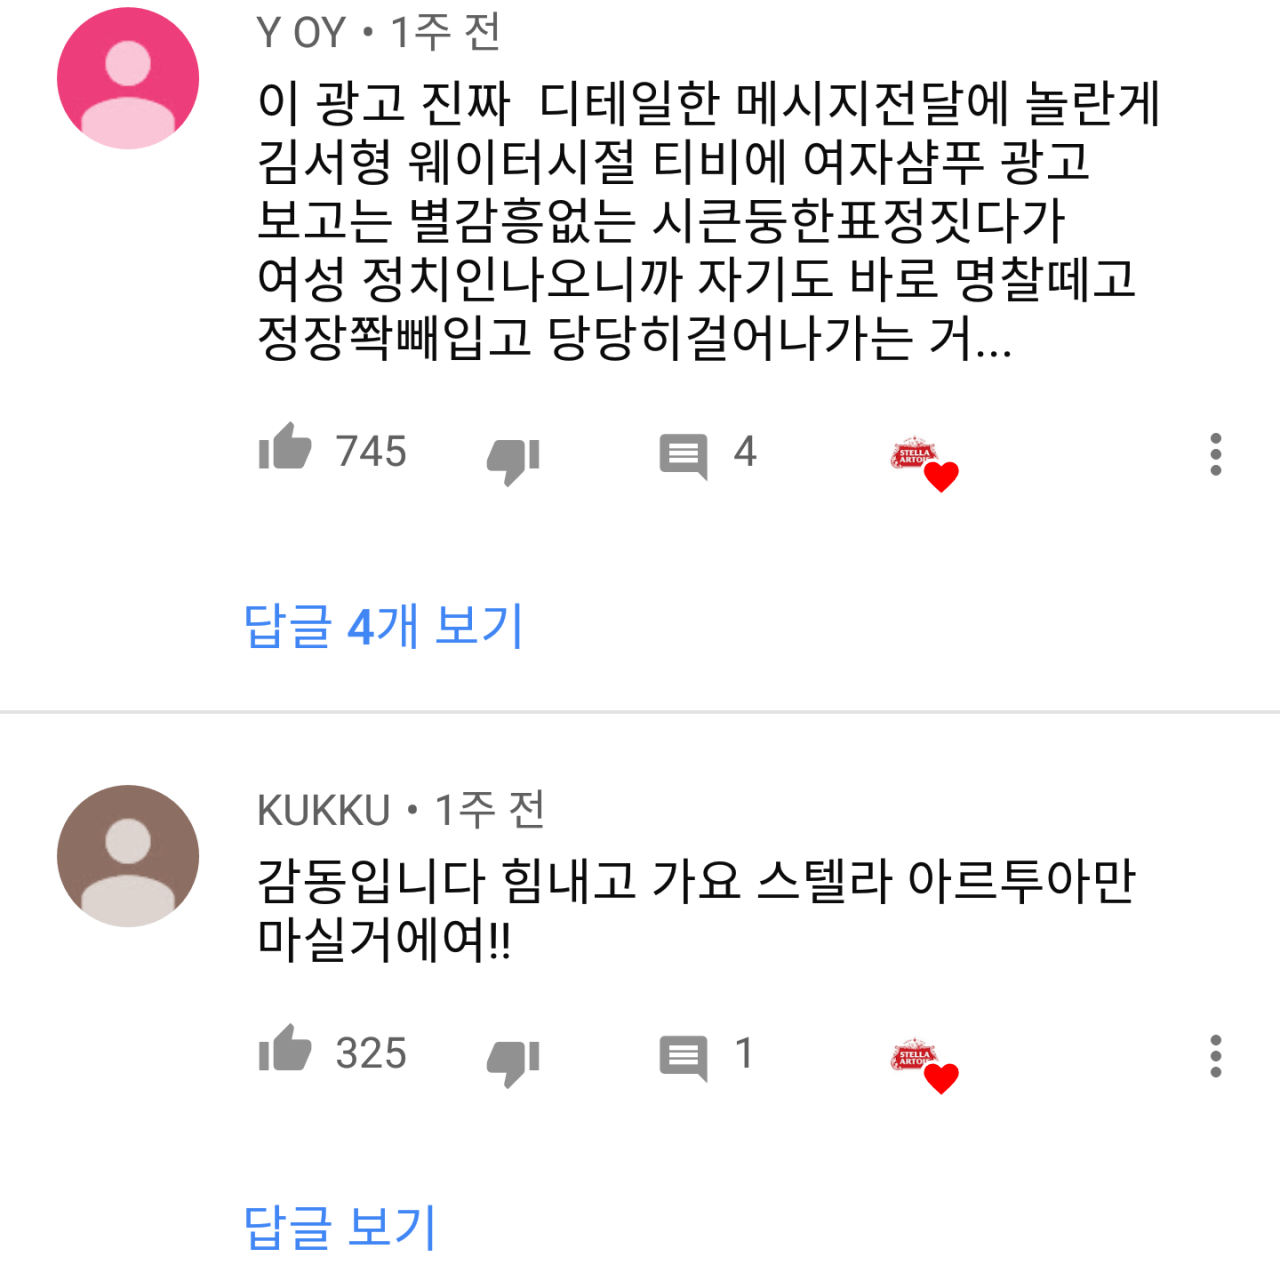 Screenshot_2019-05-24-02-45-38~01.png 알탕영화 김서형의 맥주 광고를 알아보자